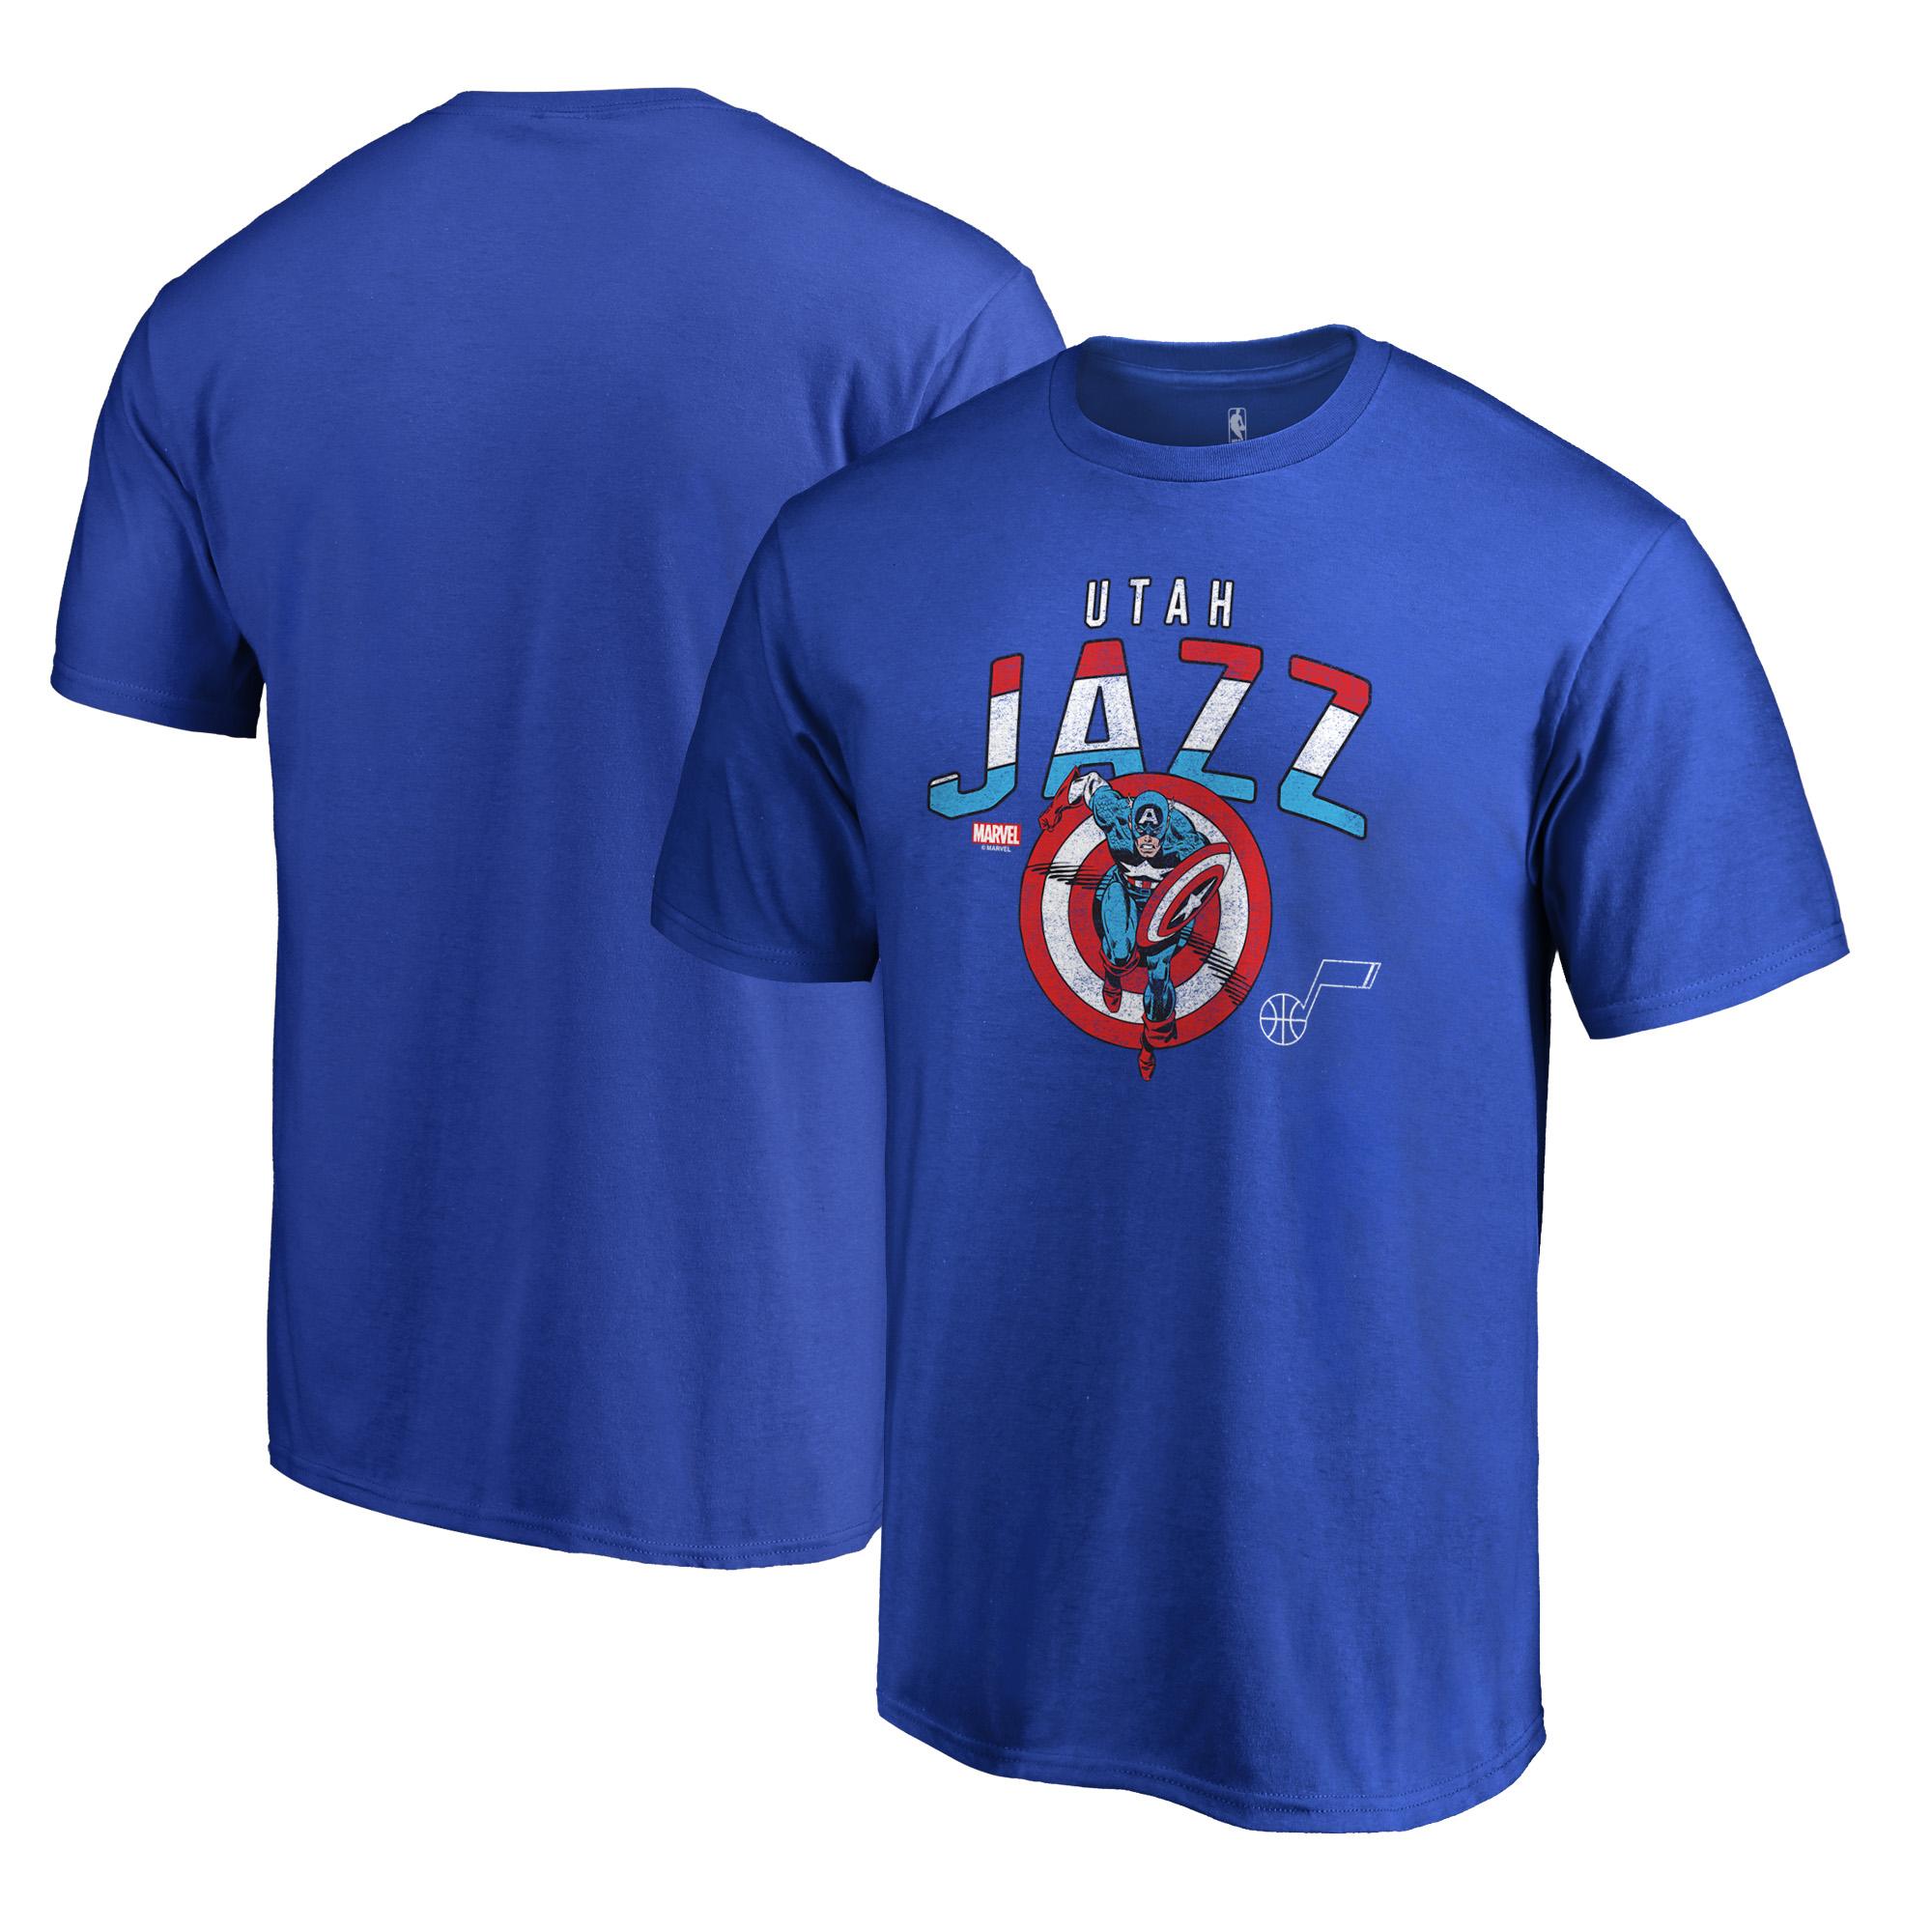 Utah Jazz Fanatics Branded Captain's Shield T-Shirt - Royal